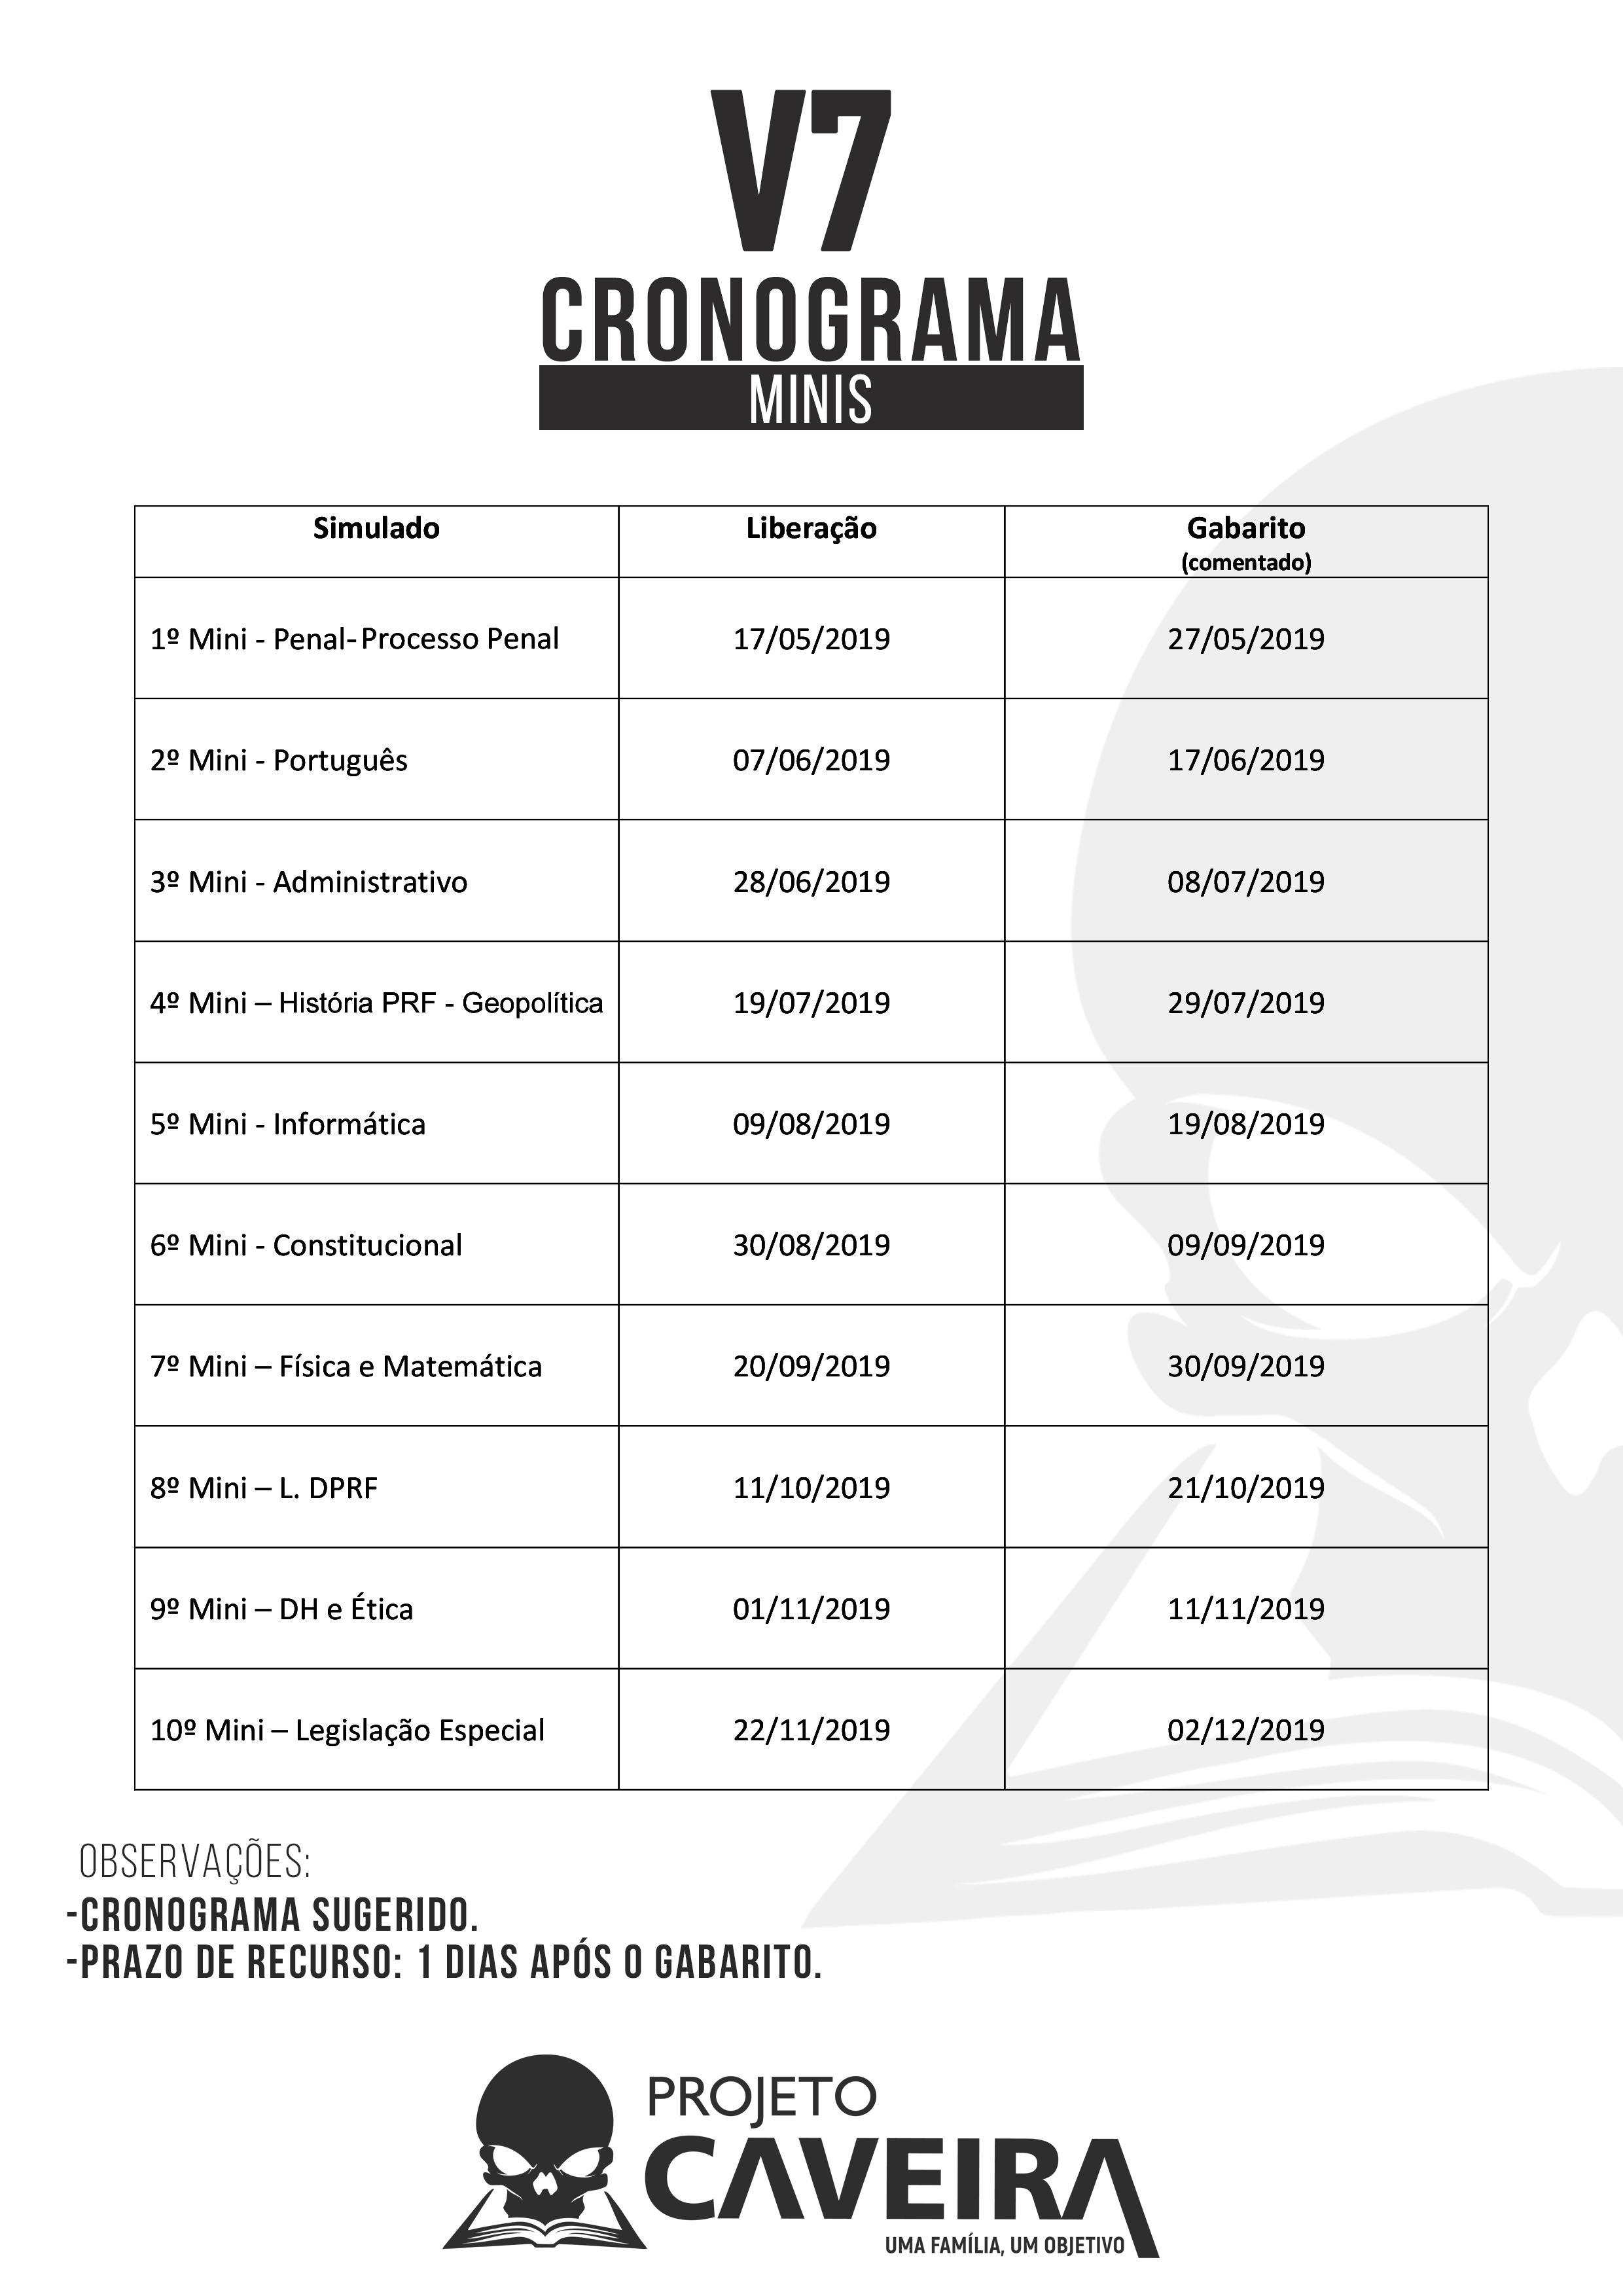 CronogramaV7Minis